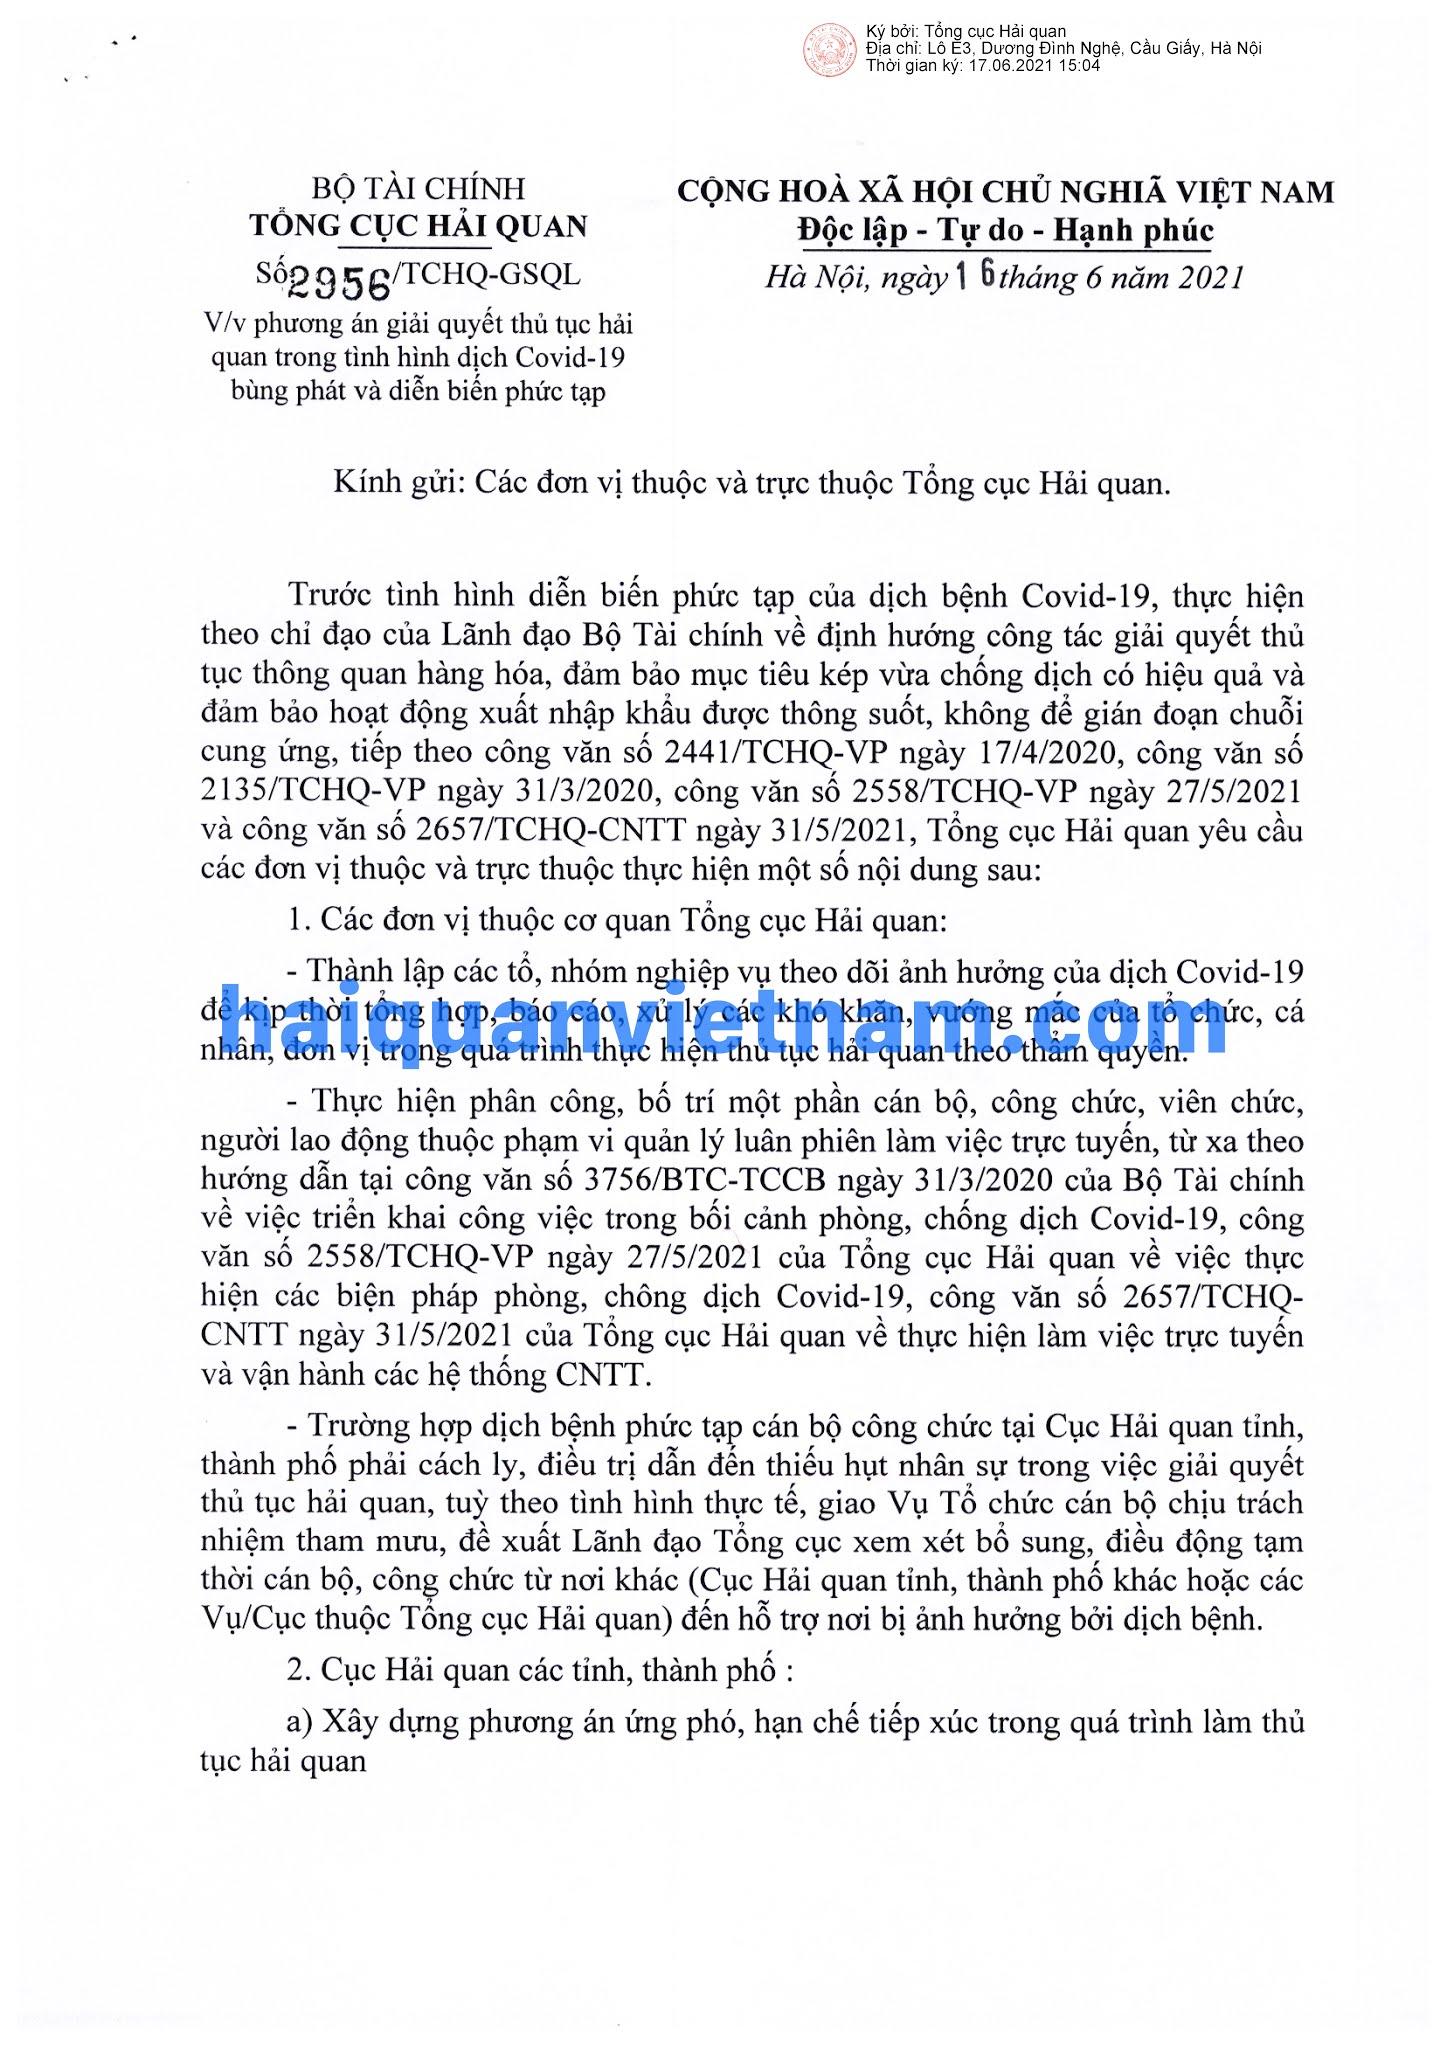 [Image: 210616_2956_TCHQ-GSQL_haiquanvietnam_01.jpg]